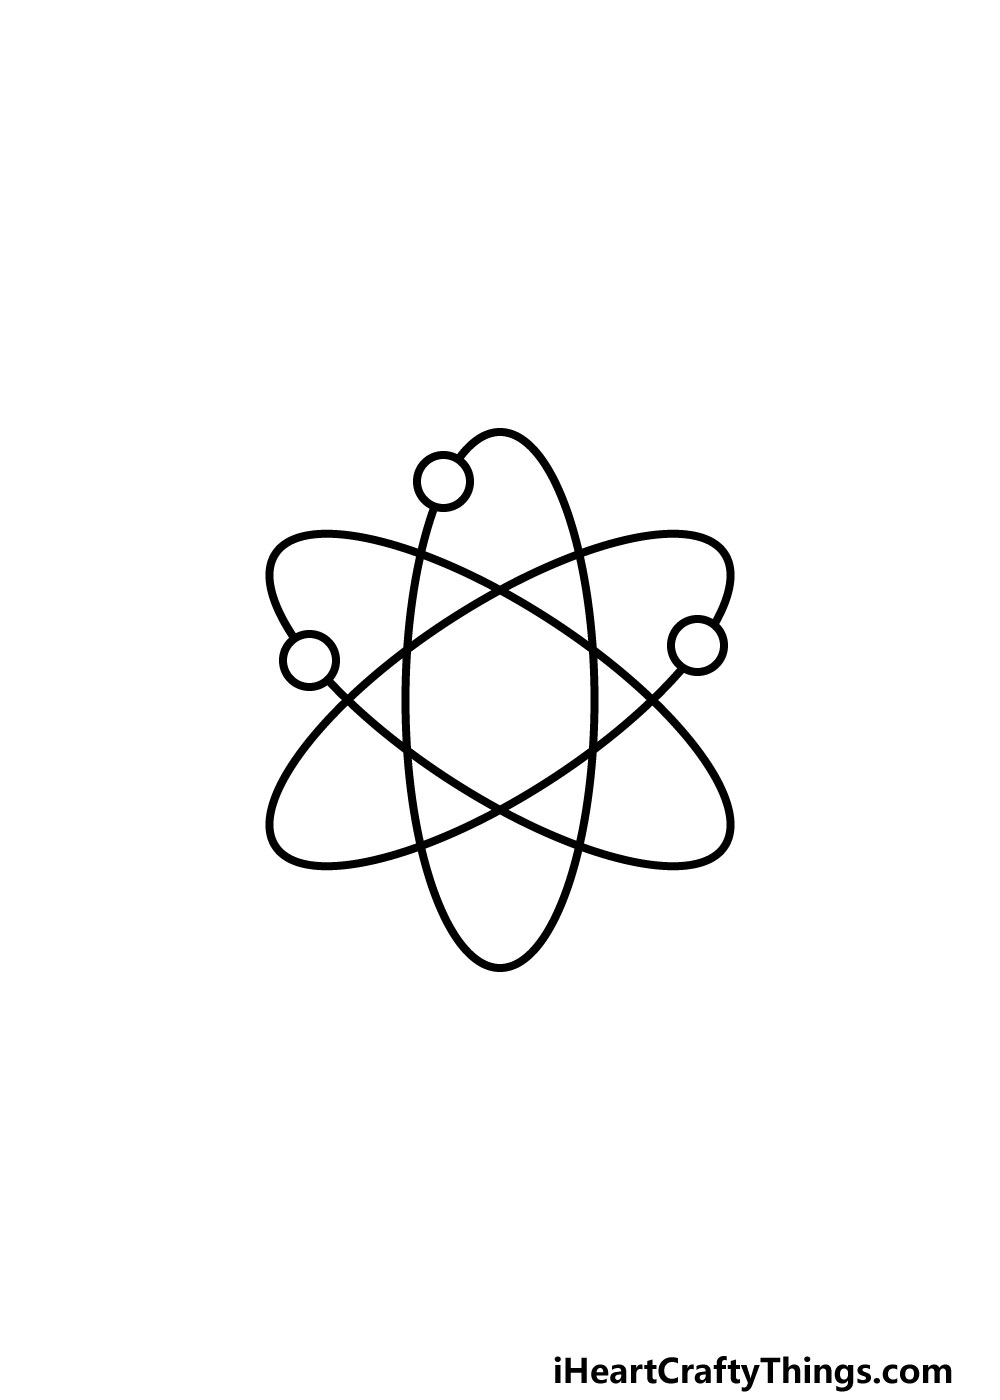 drawing an atom step 4